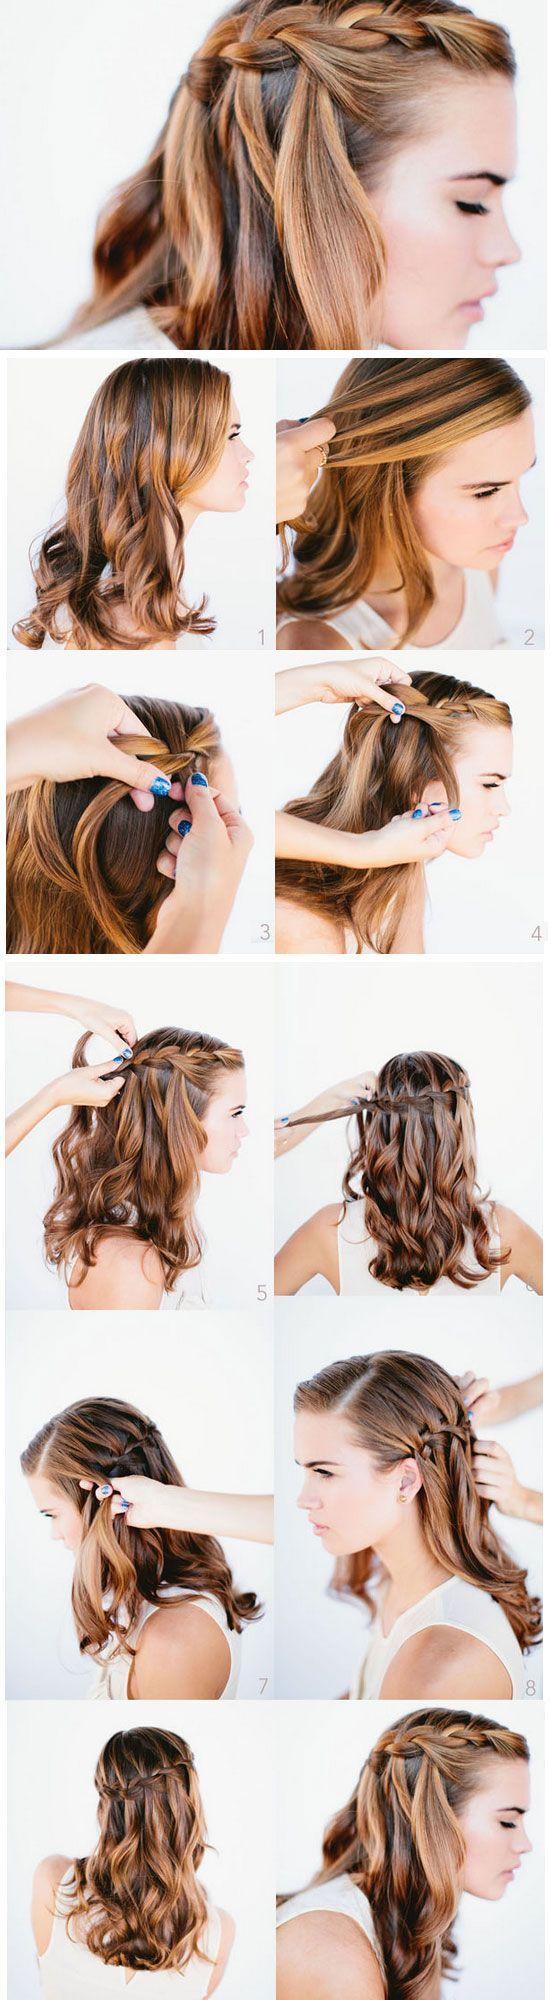 diy heatless hairstyles for long hair hairstyles iud love to